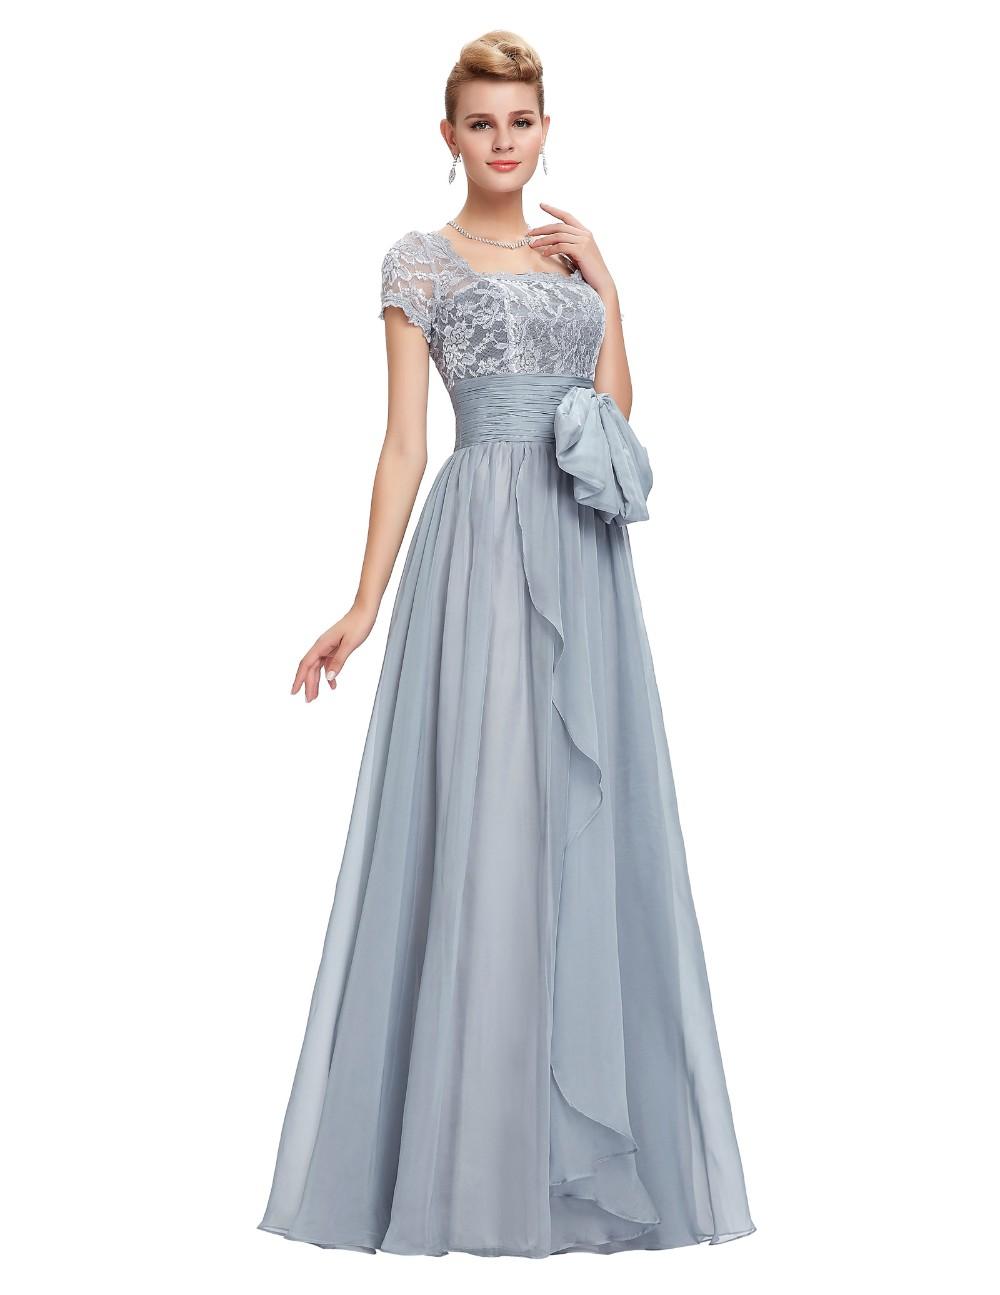 Grace Karin Chiffon Lace Elegant Long Evening Dresses Grey Formal Evening Gowns robe de soiree longue GK4445 6